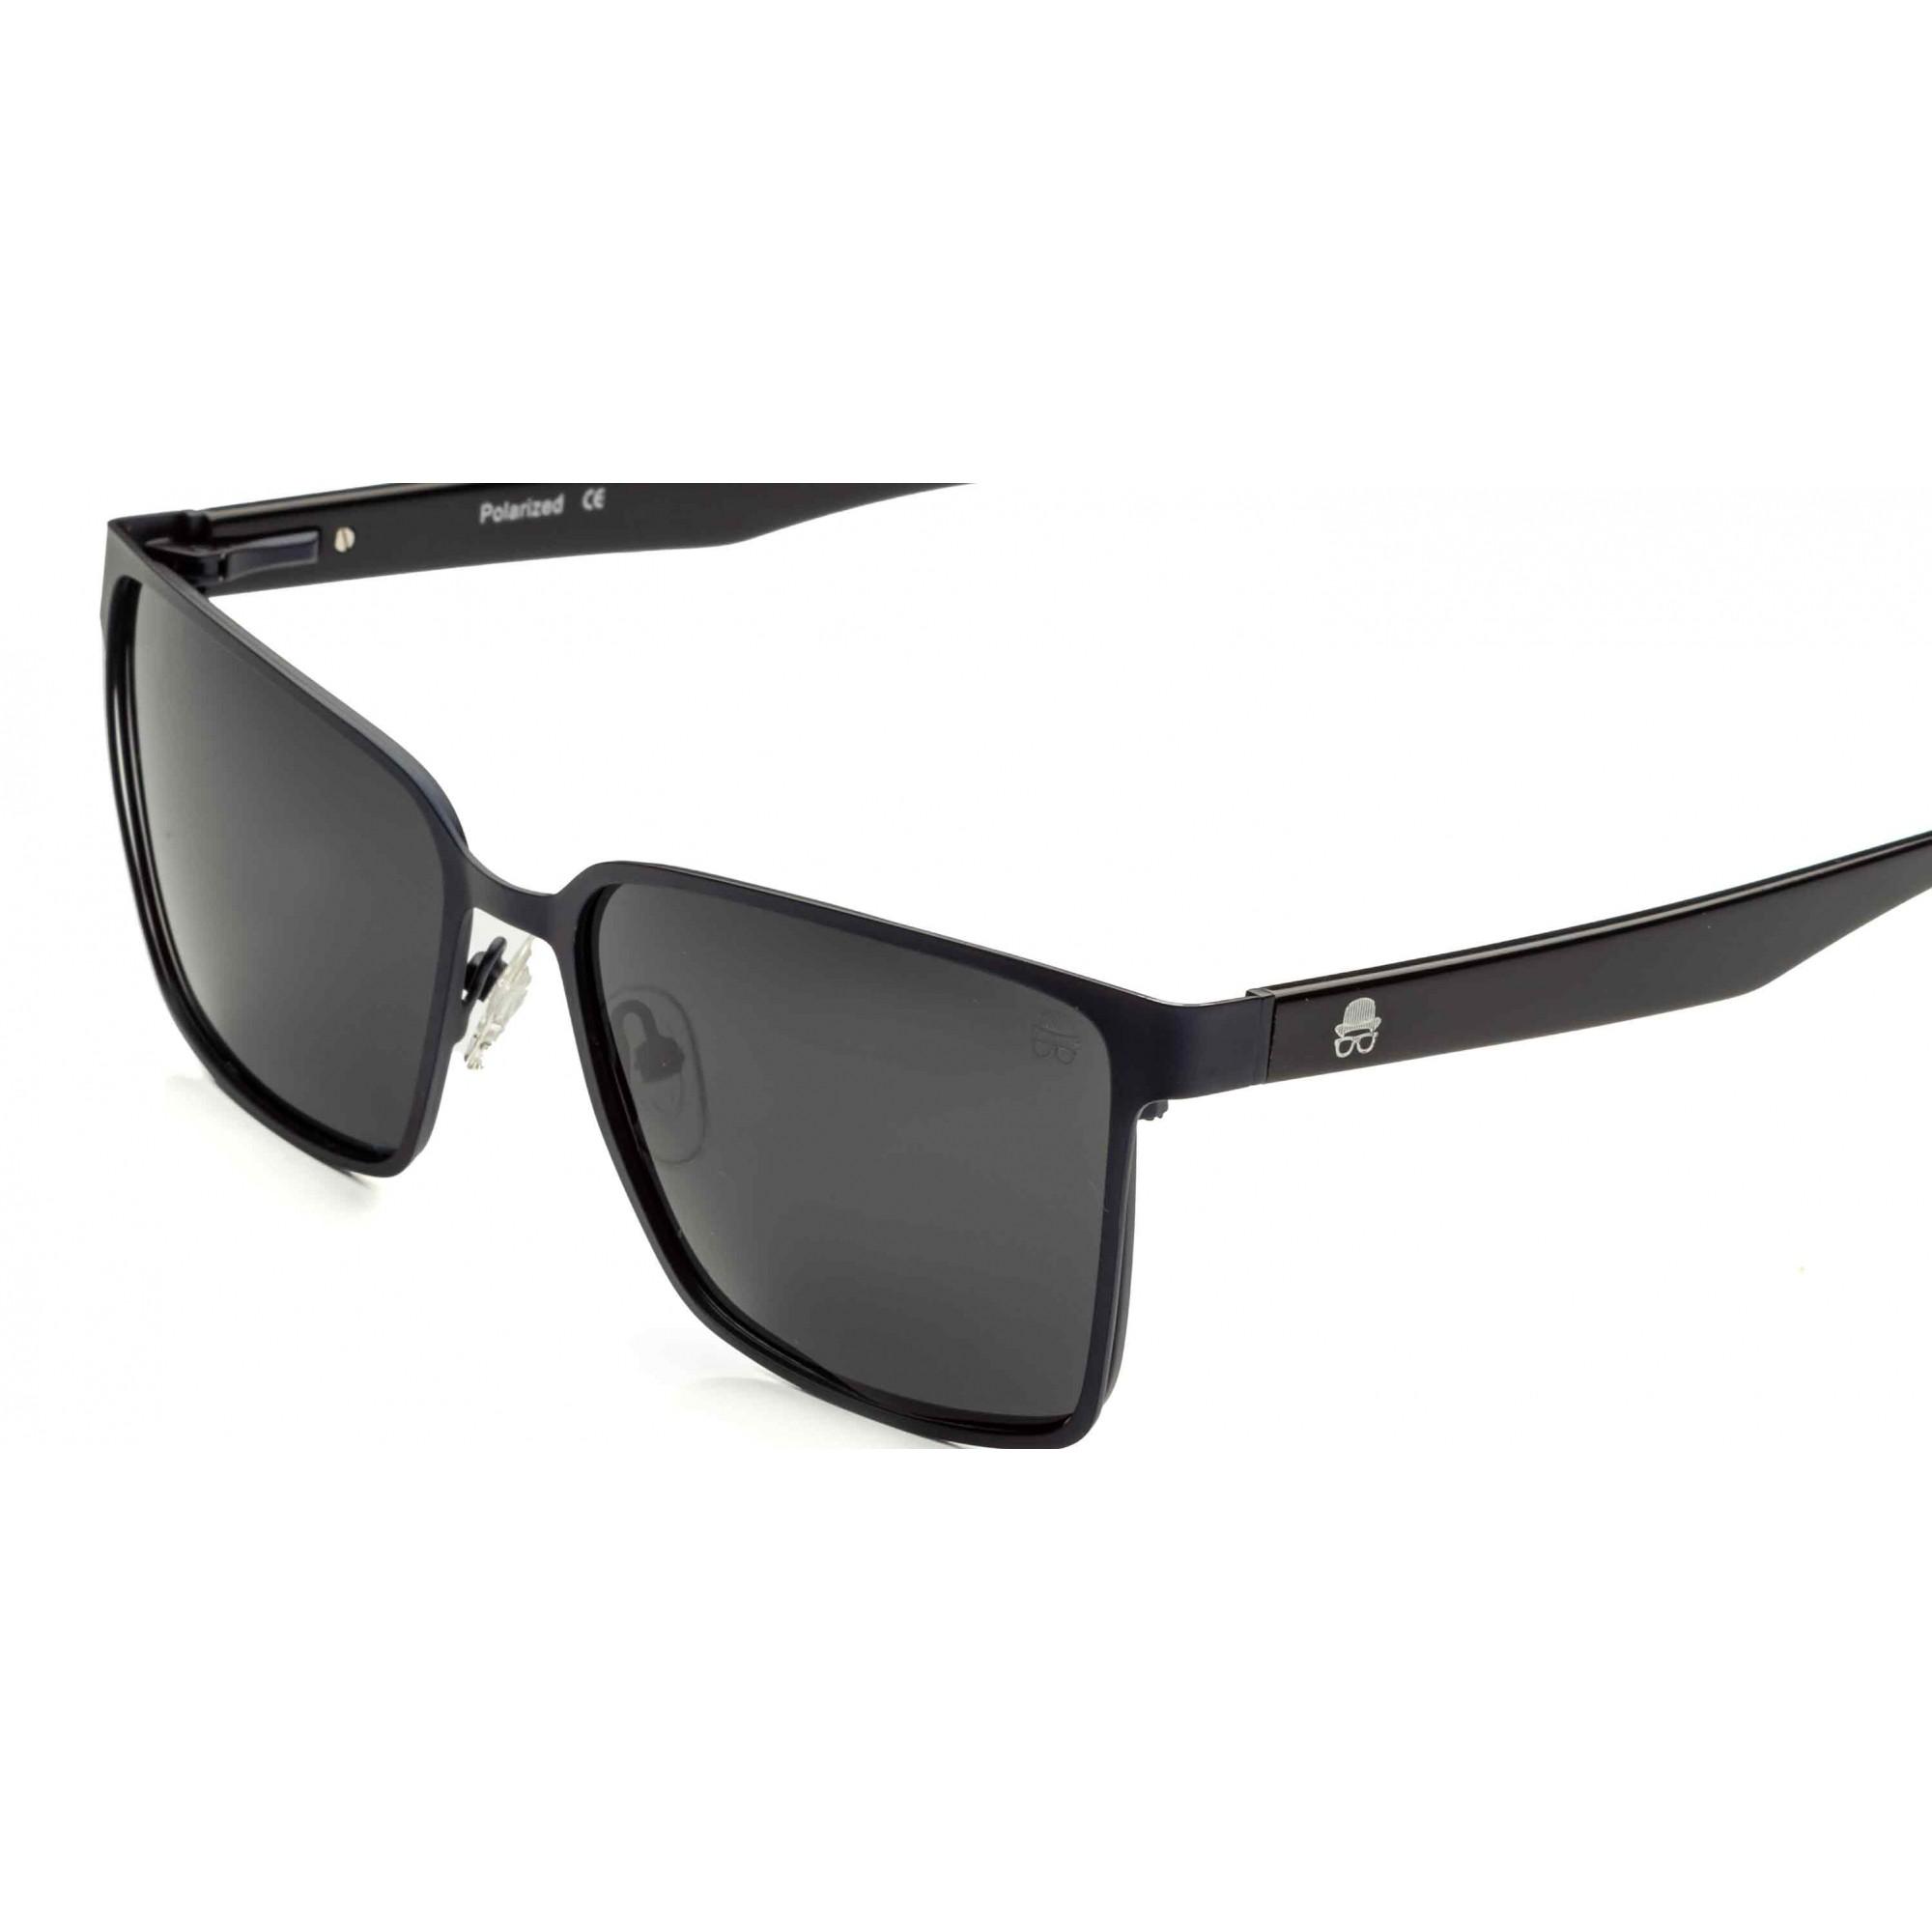 Vibranium - Rafael Lopes Eyewear